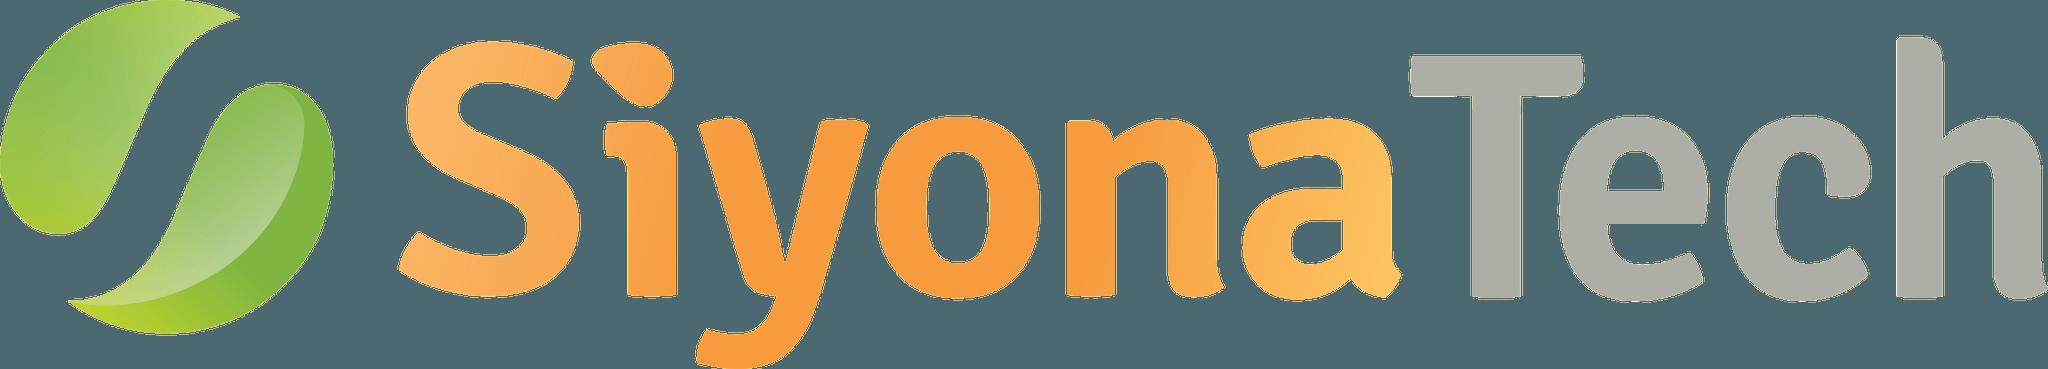 Siyona Tech